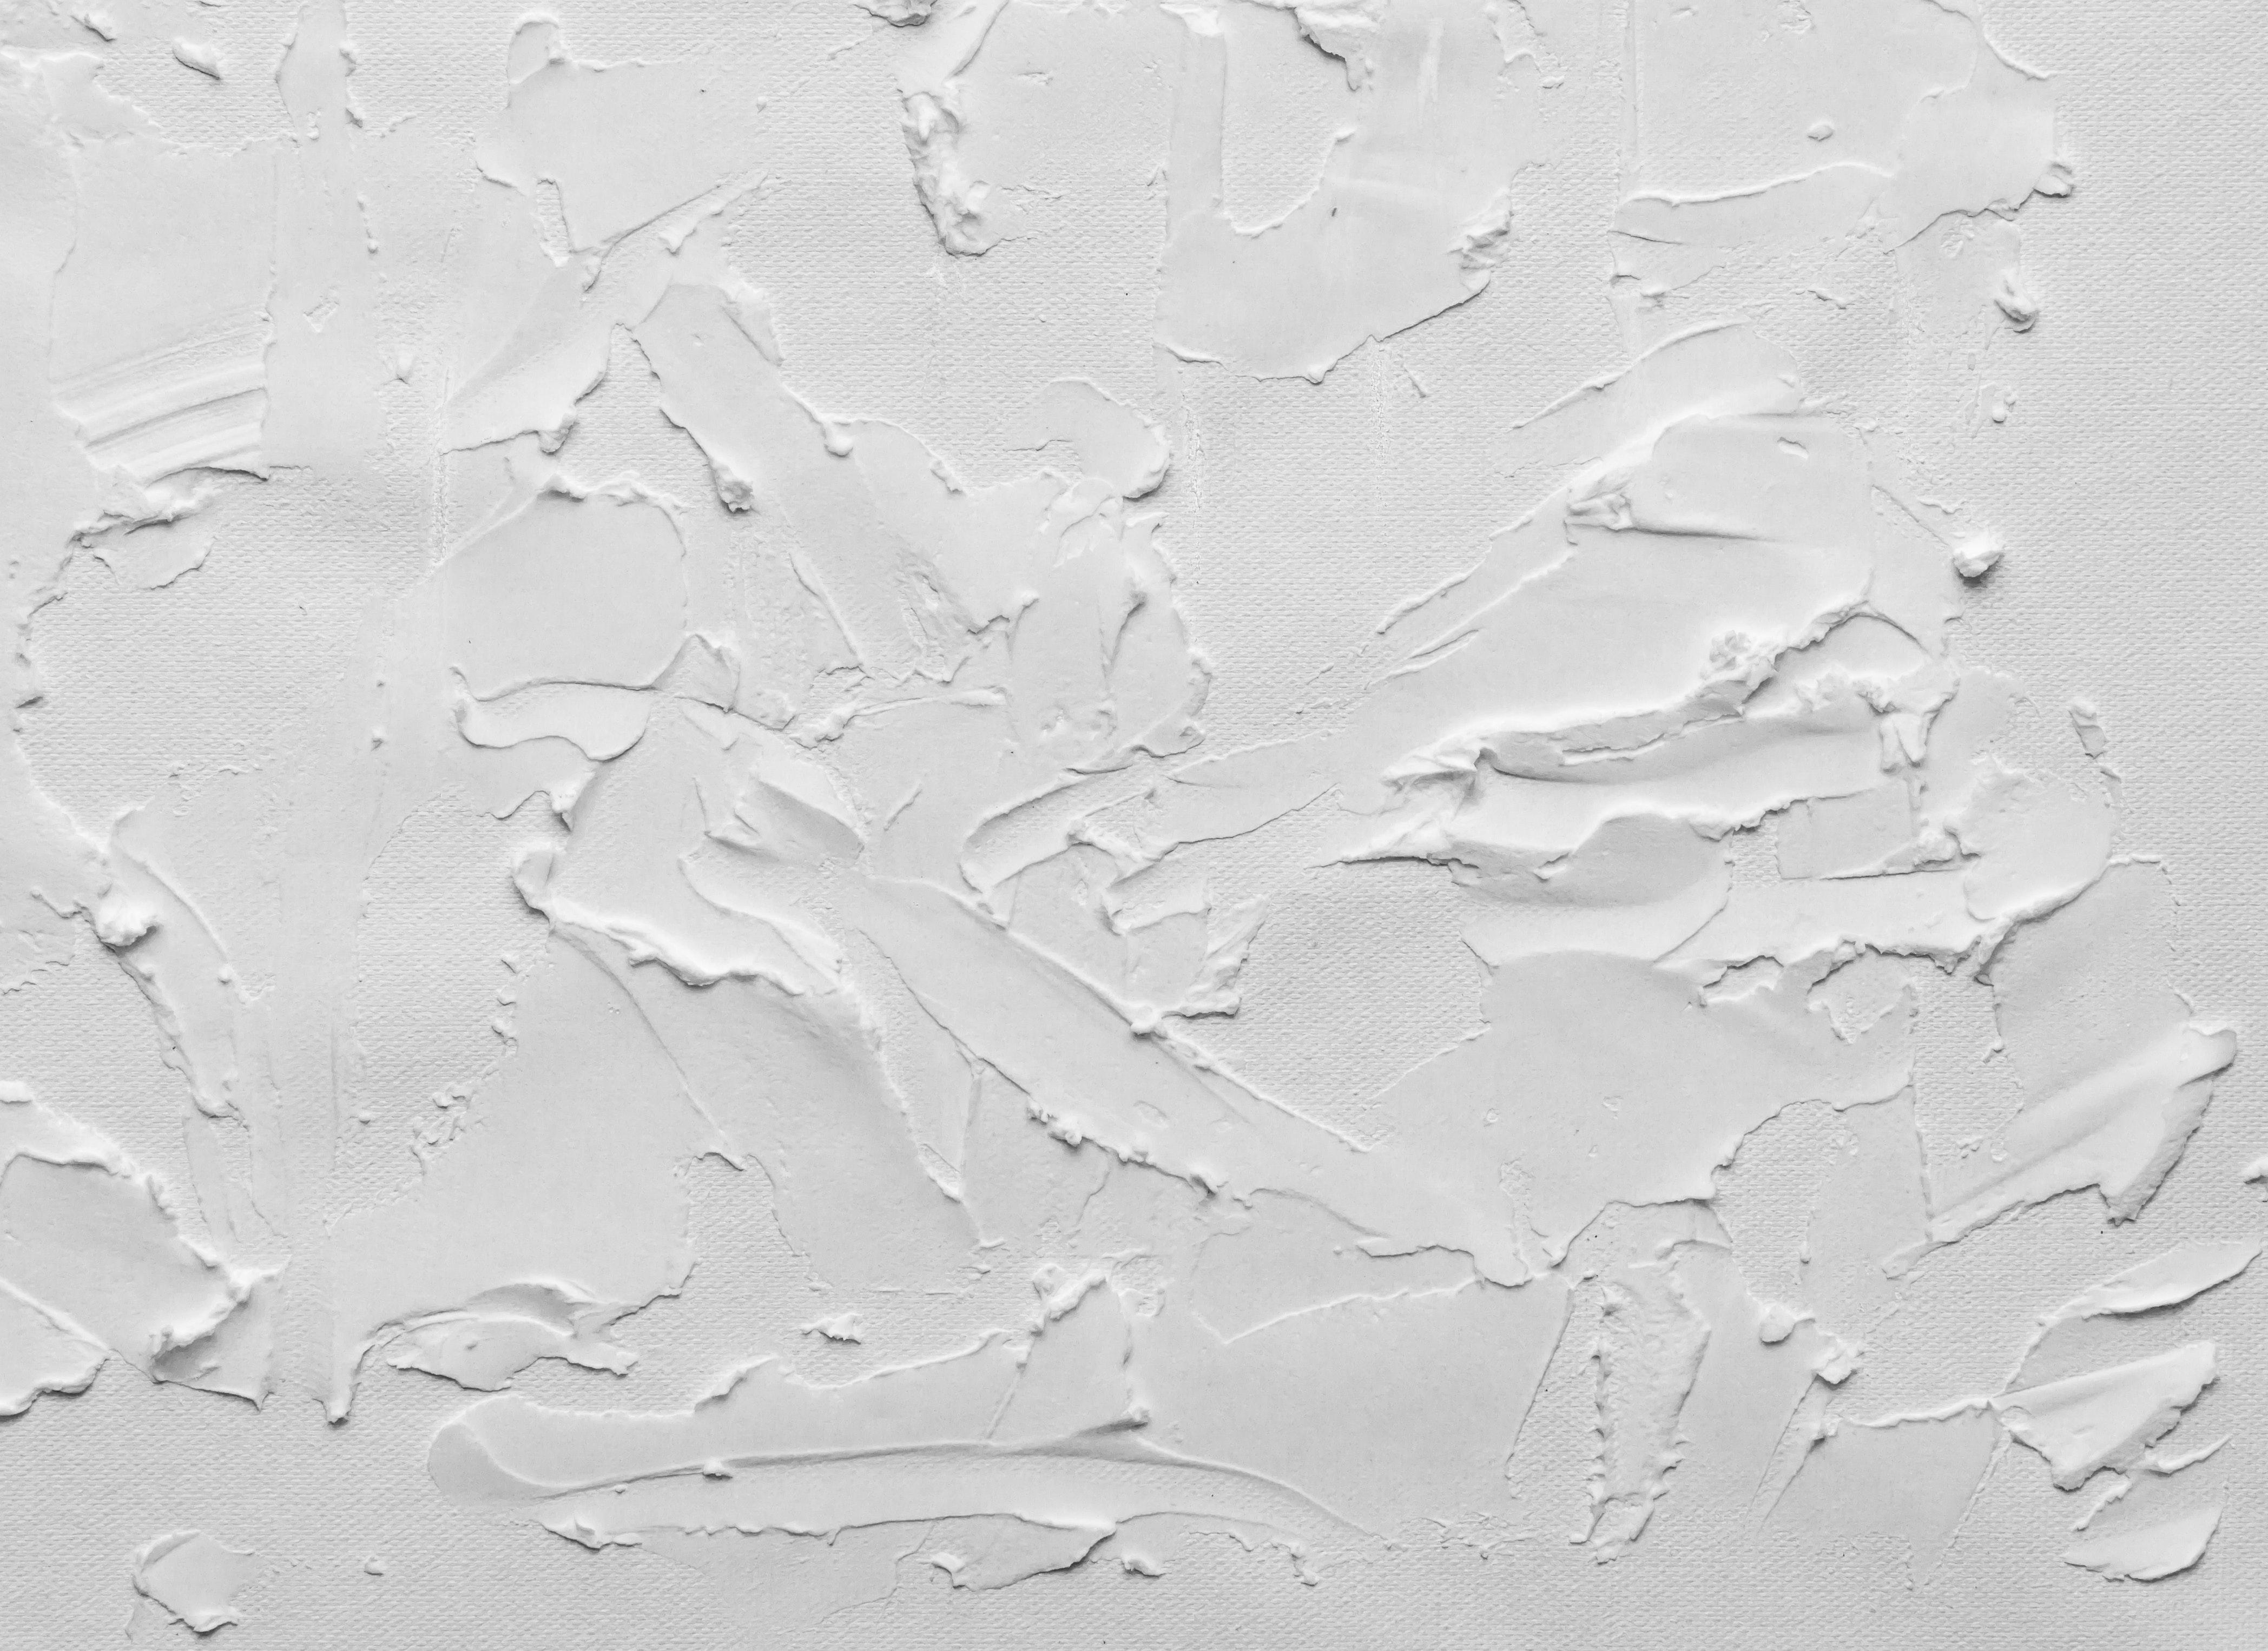 1000 Beautiful White Background Photos 183 Pexels 183 Free